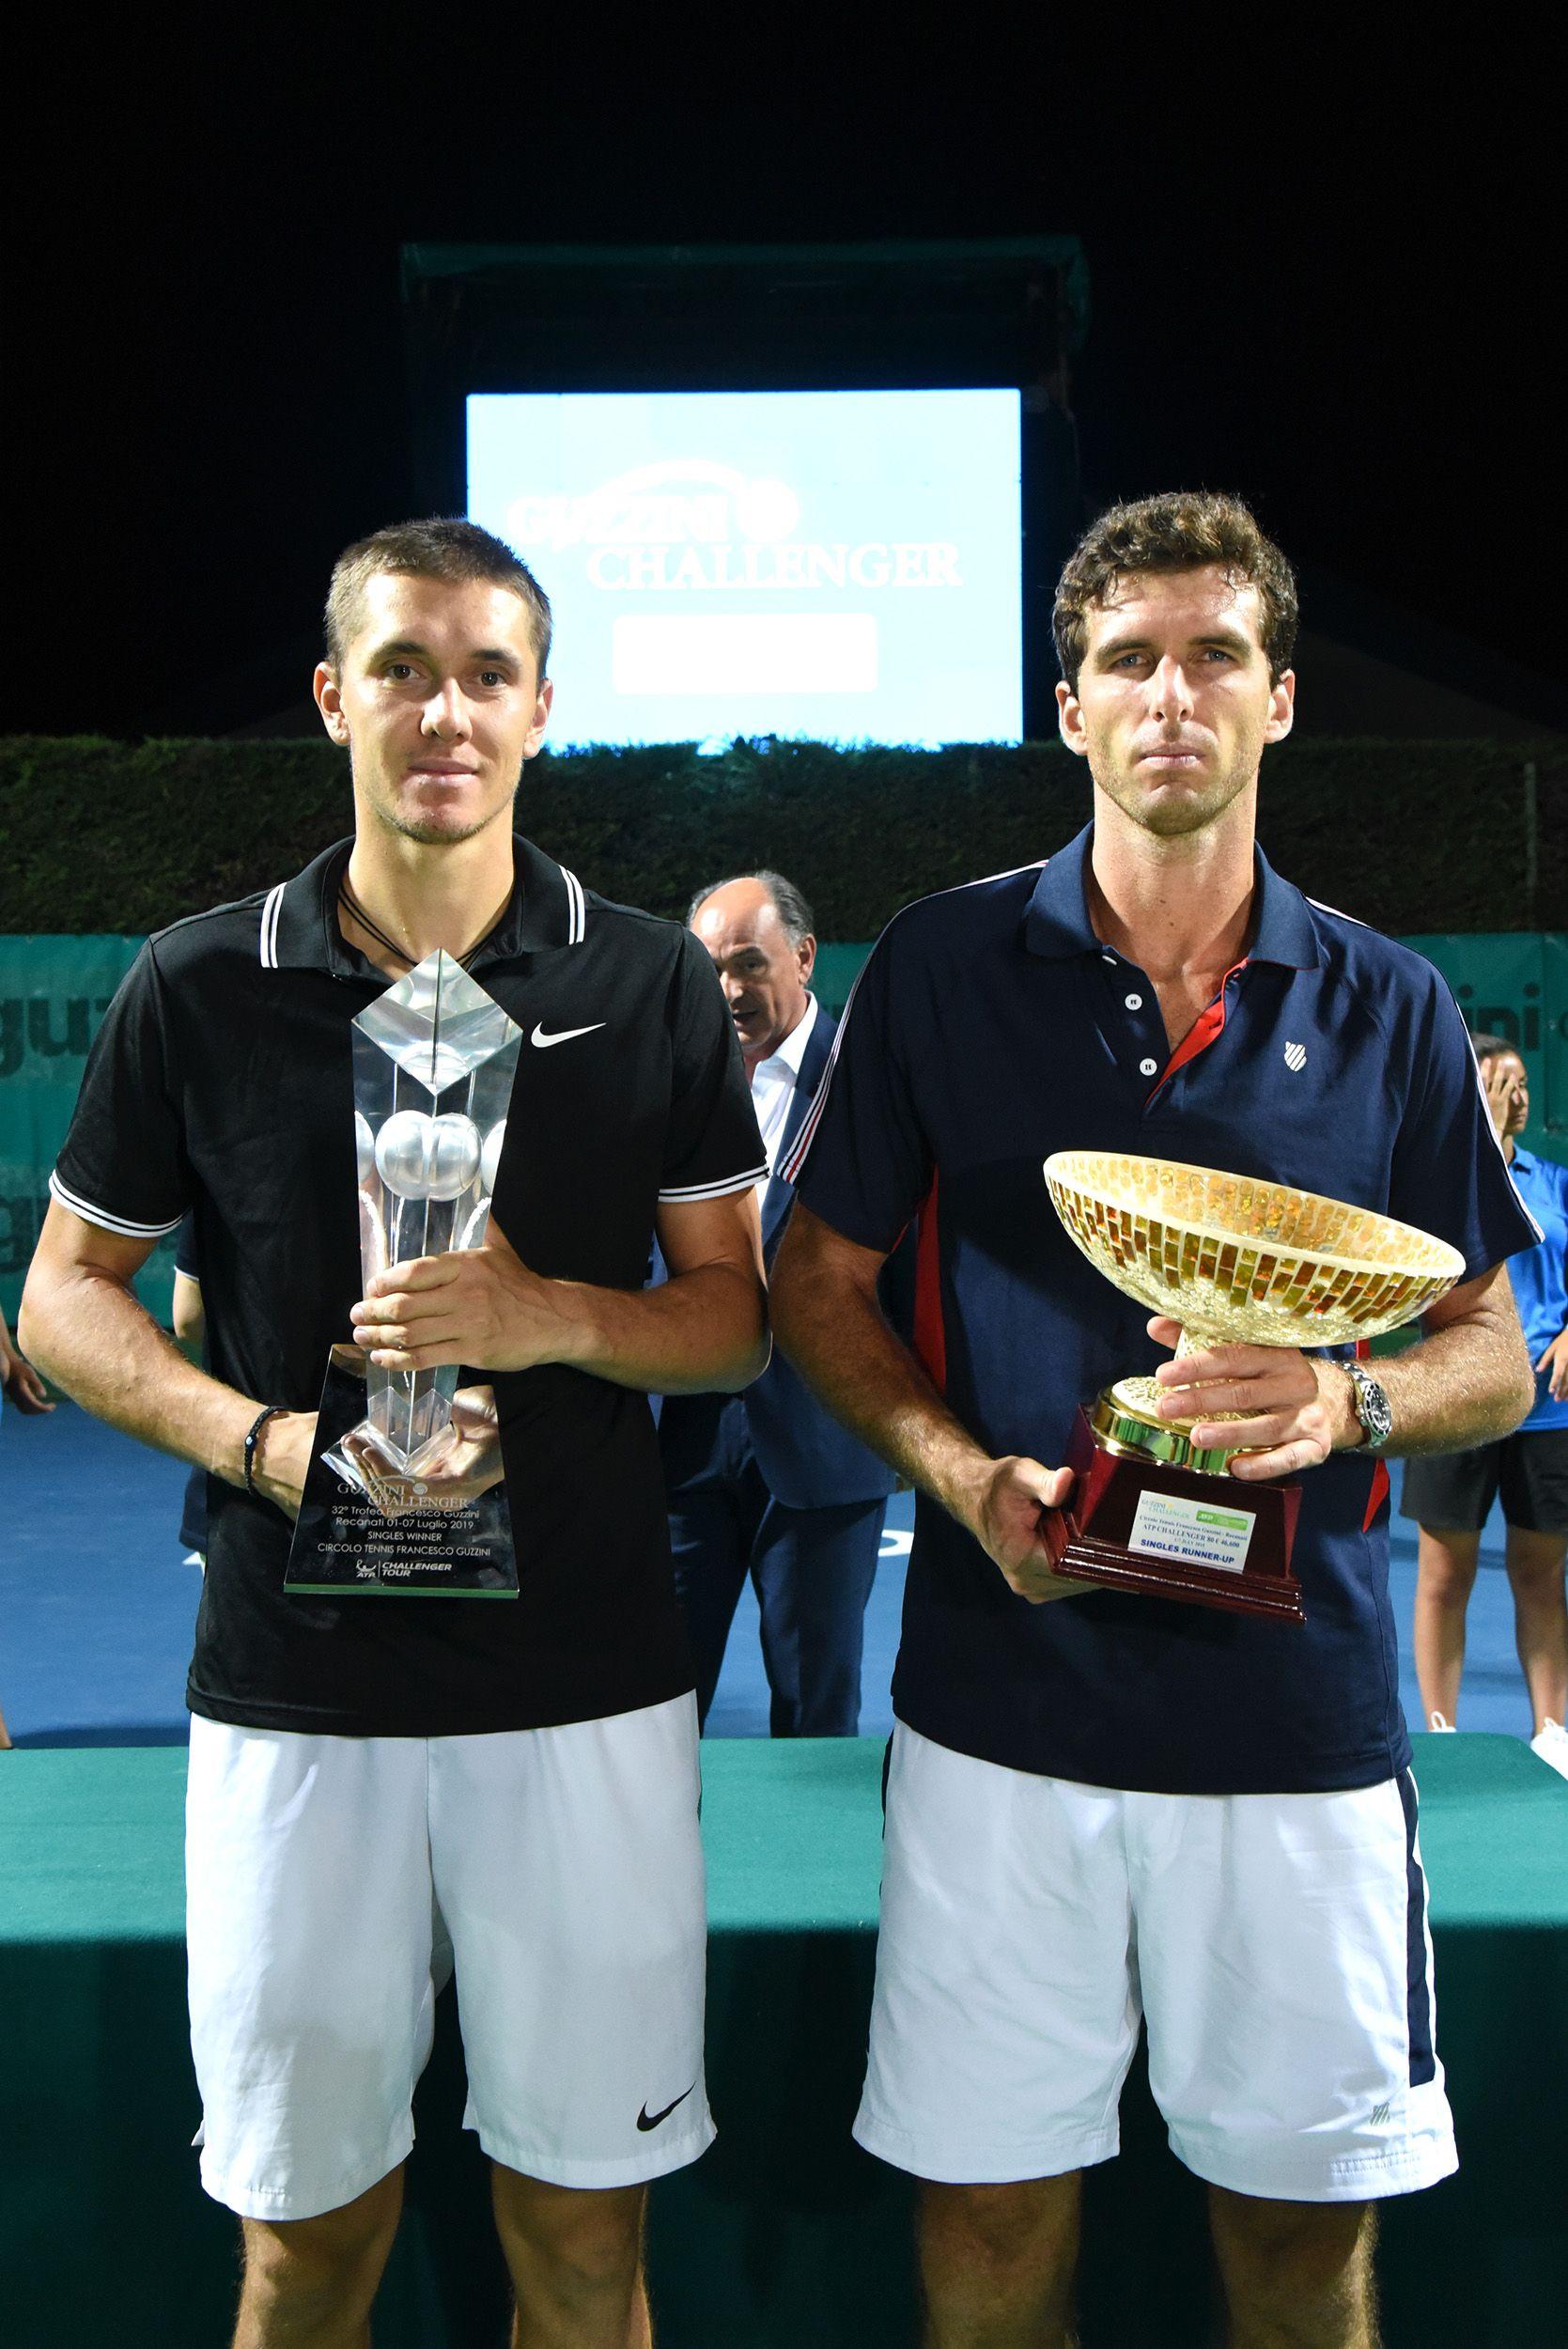 Egor Gerasimov e Roberto Marcora nella foto